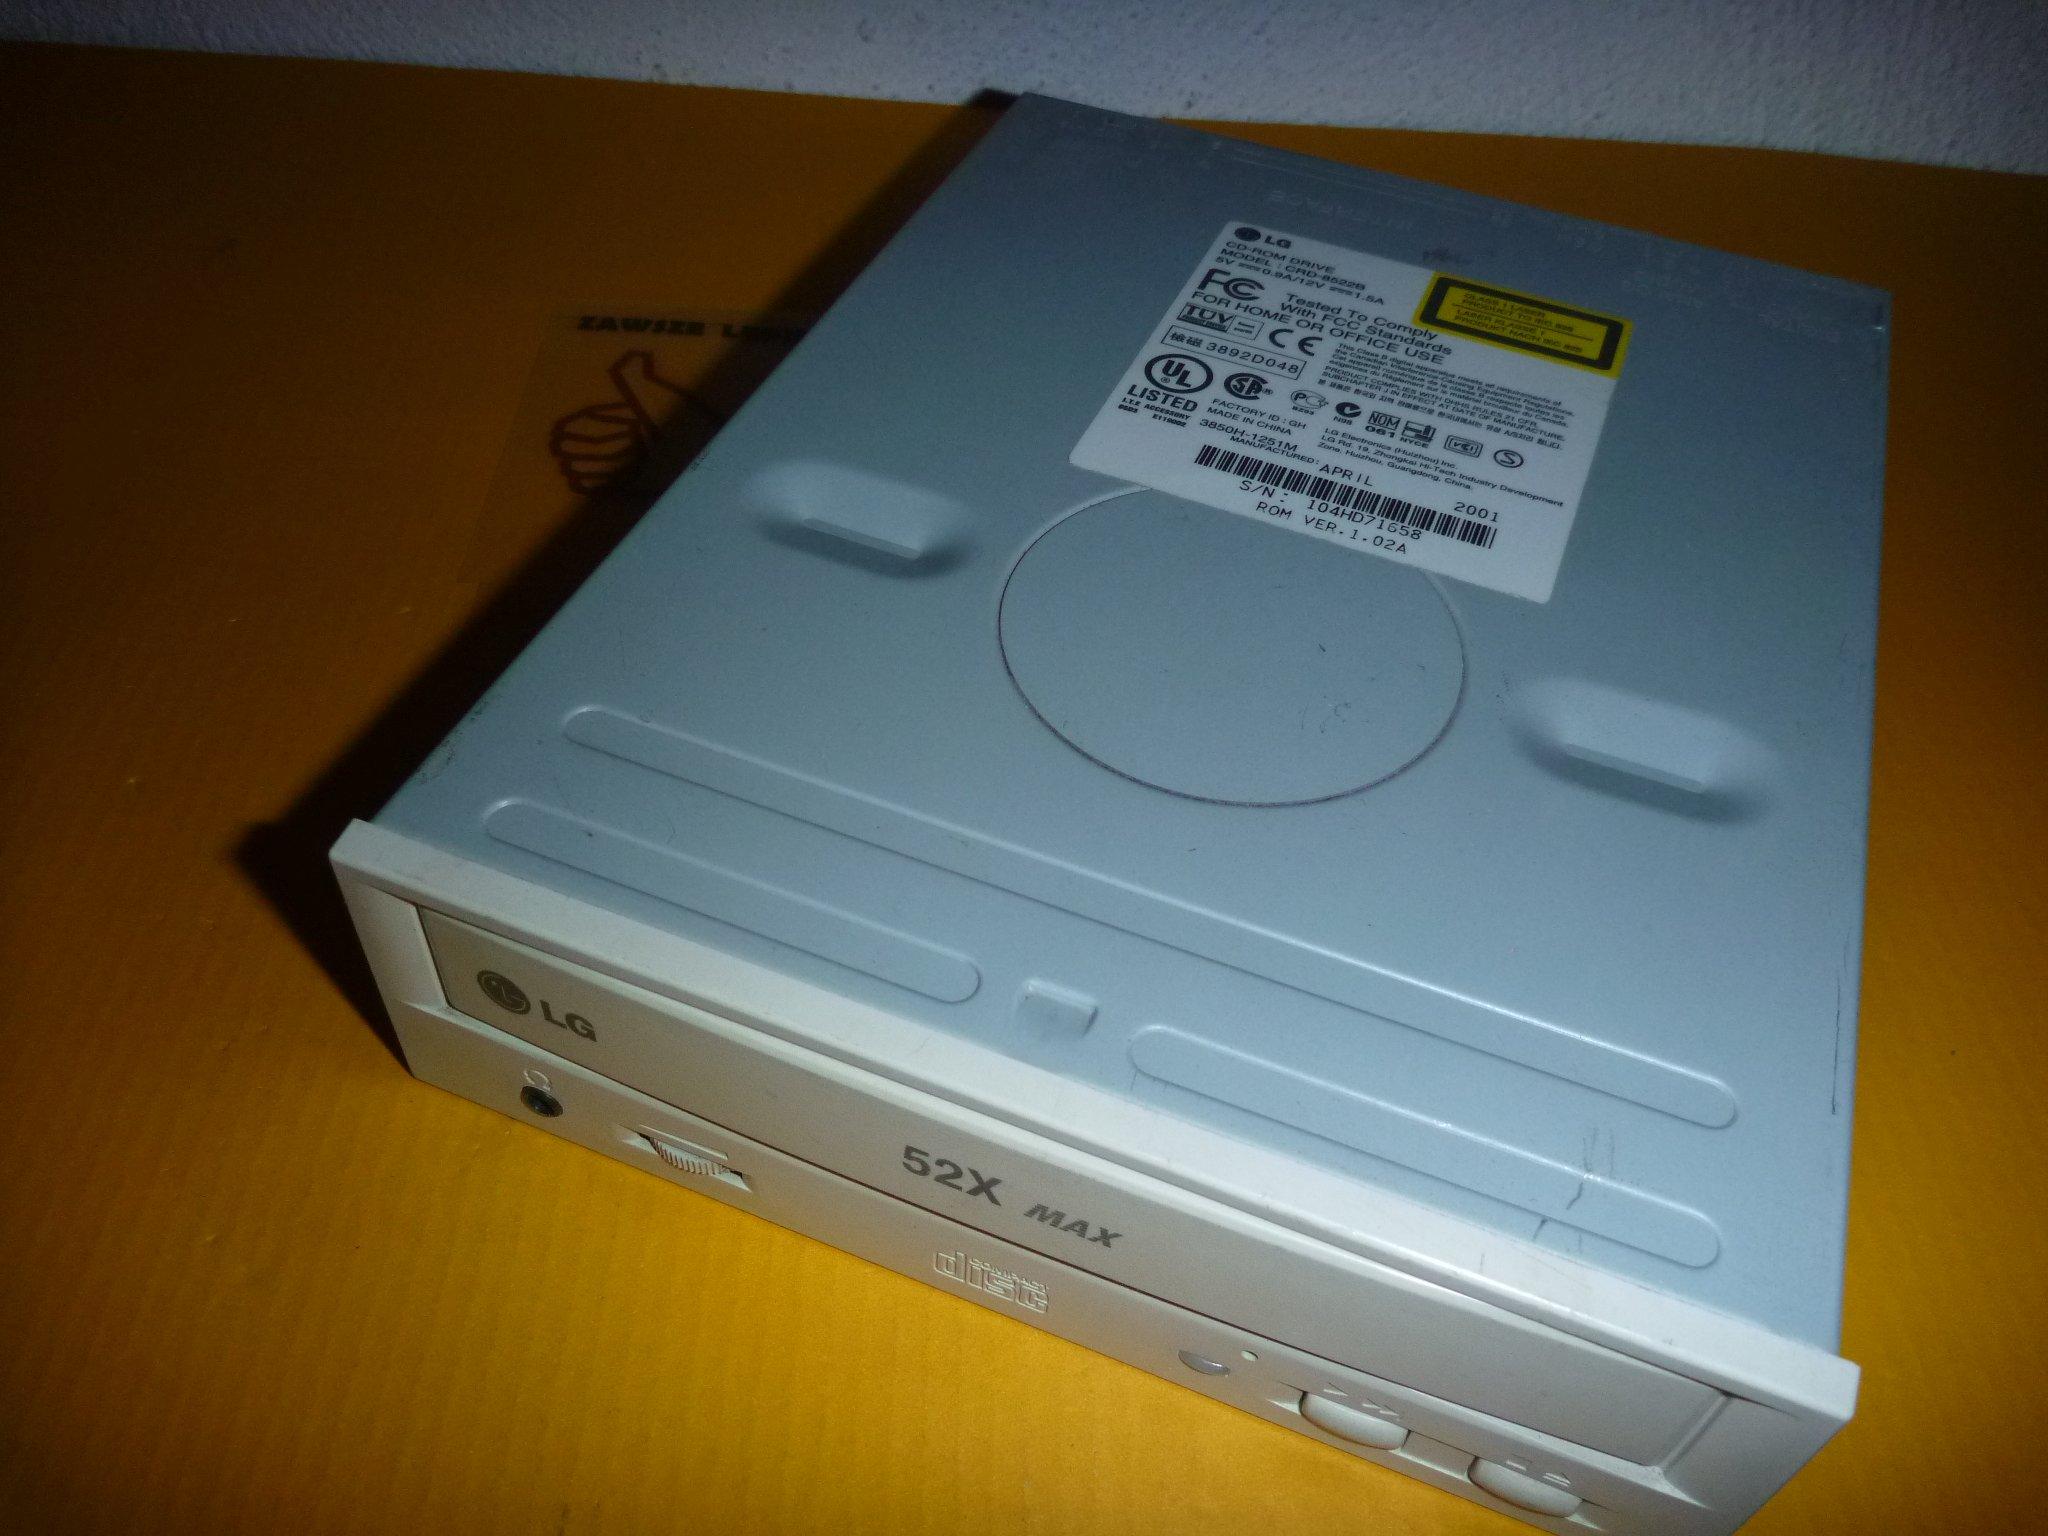 LG CRD-8522B WINDOWS XP DRIVER